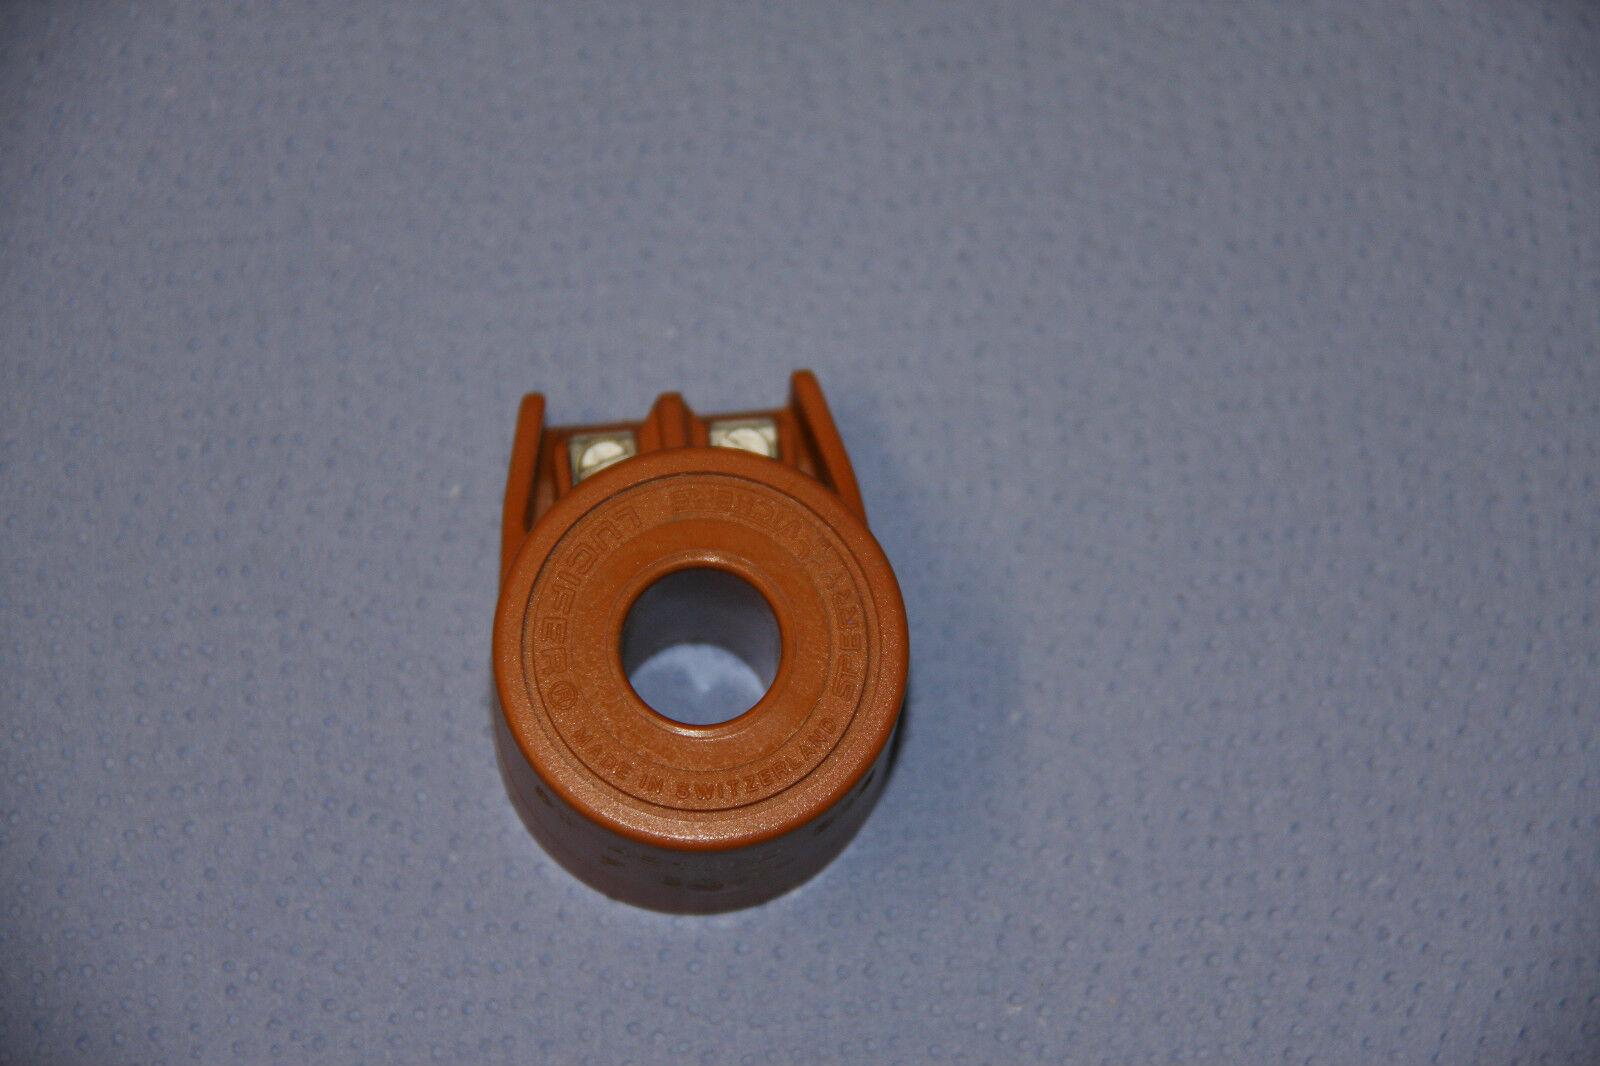 Hartmetall Trennscheibe Sägeblatt Kreissägeblatt 160mm 60 Zähne TCT160x60Tx32H